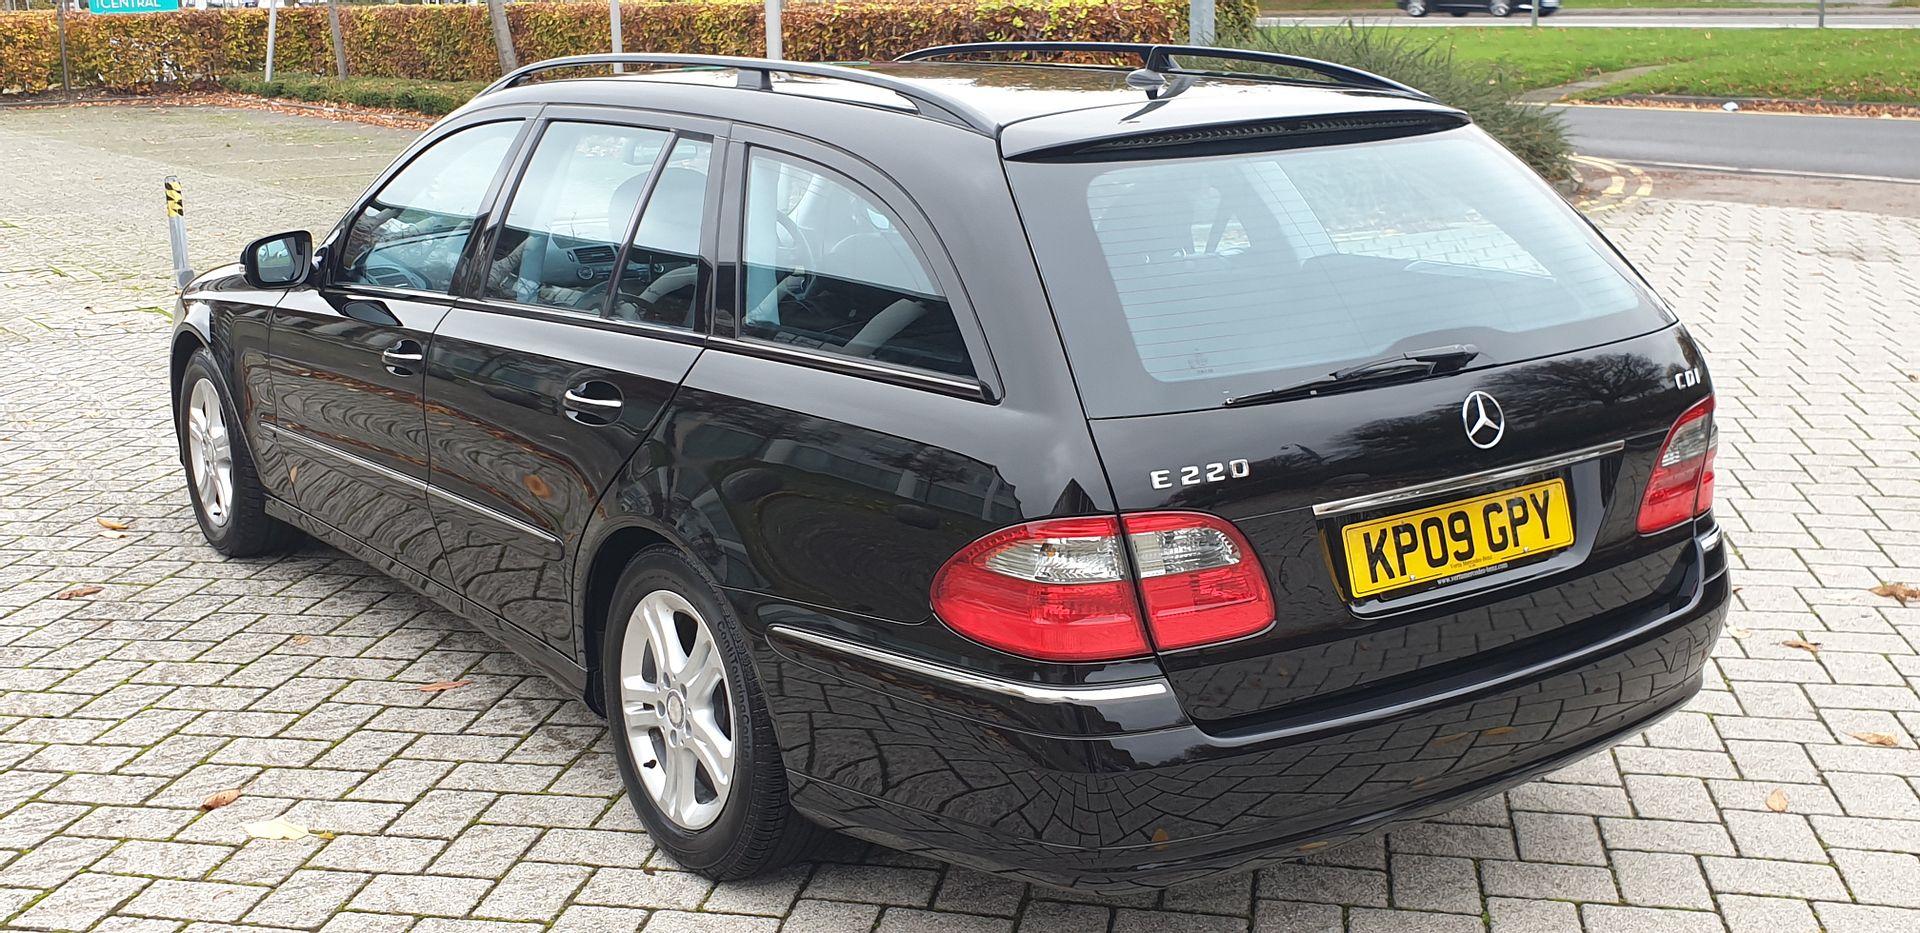 2009 Mercedes e220 cdi avantgarde estate 1 prev owner For Sale (picture 4 of 6)